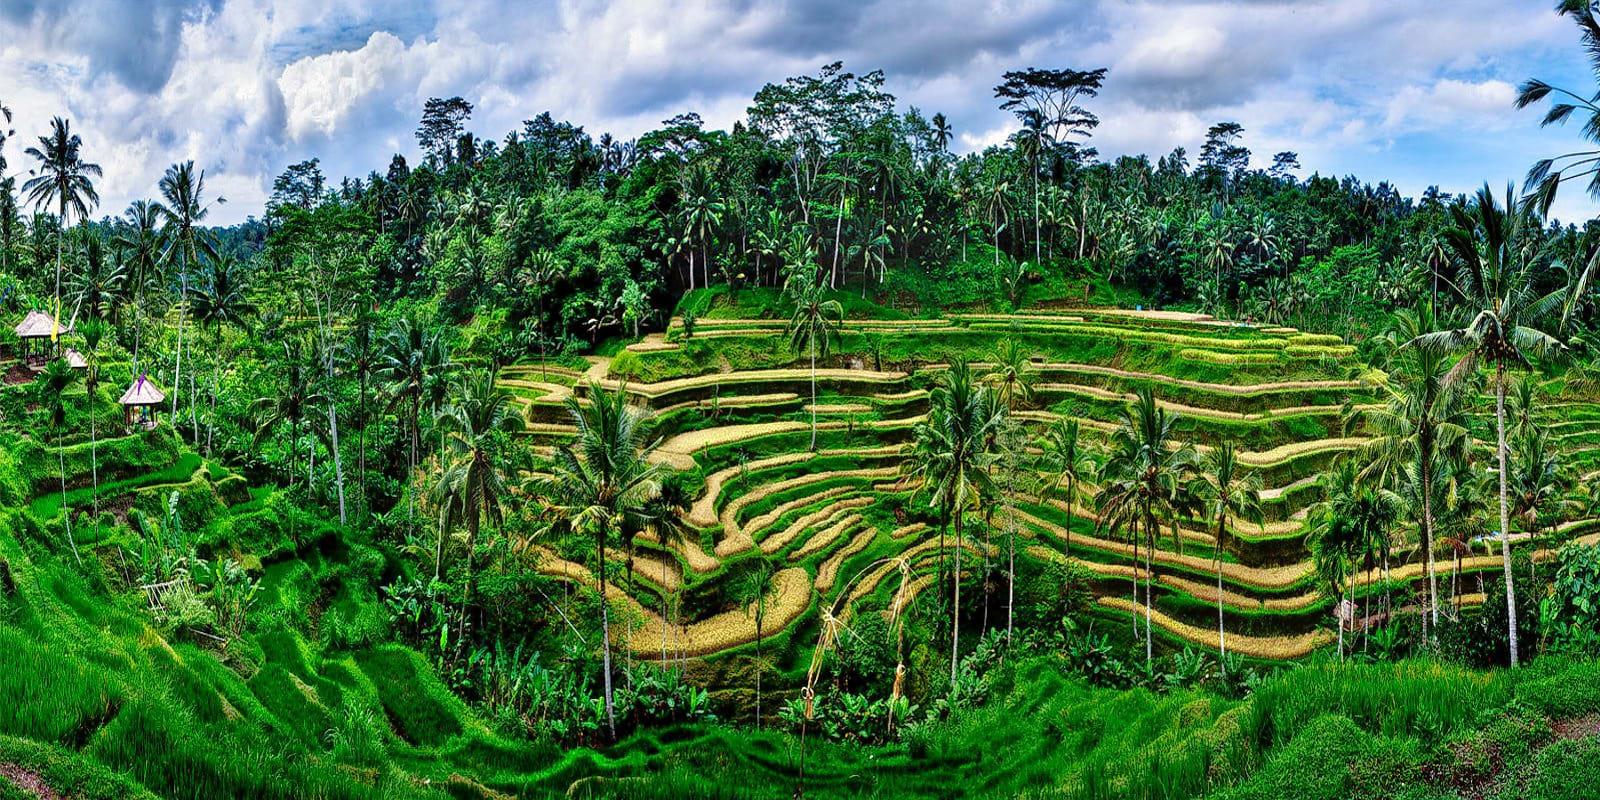 Visit Tegallalang Rice Terraces